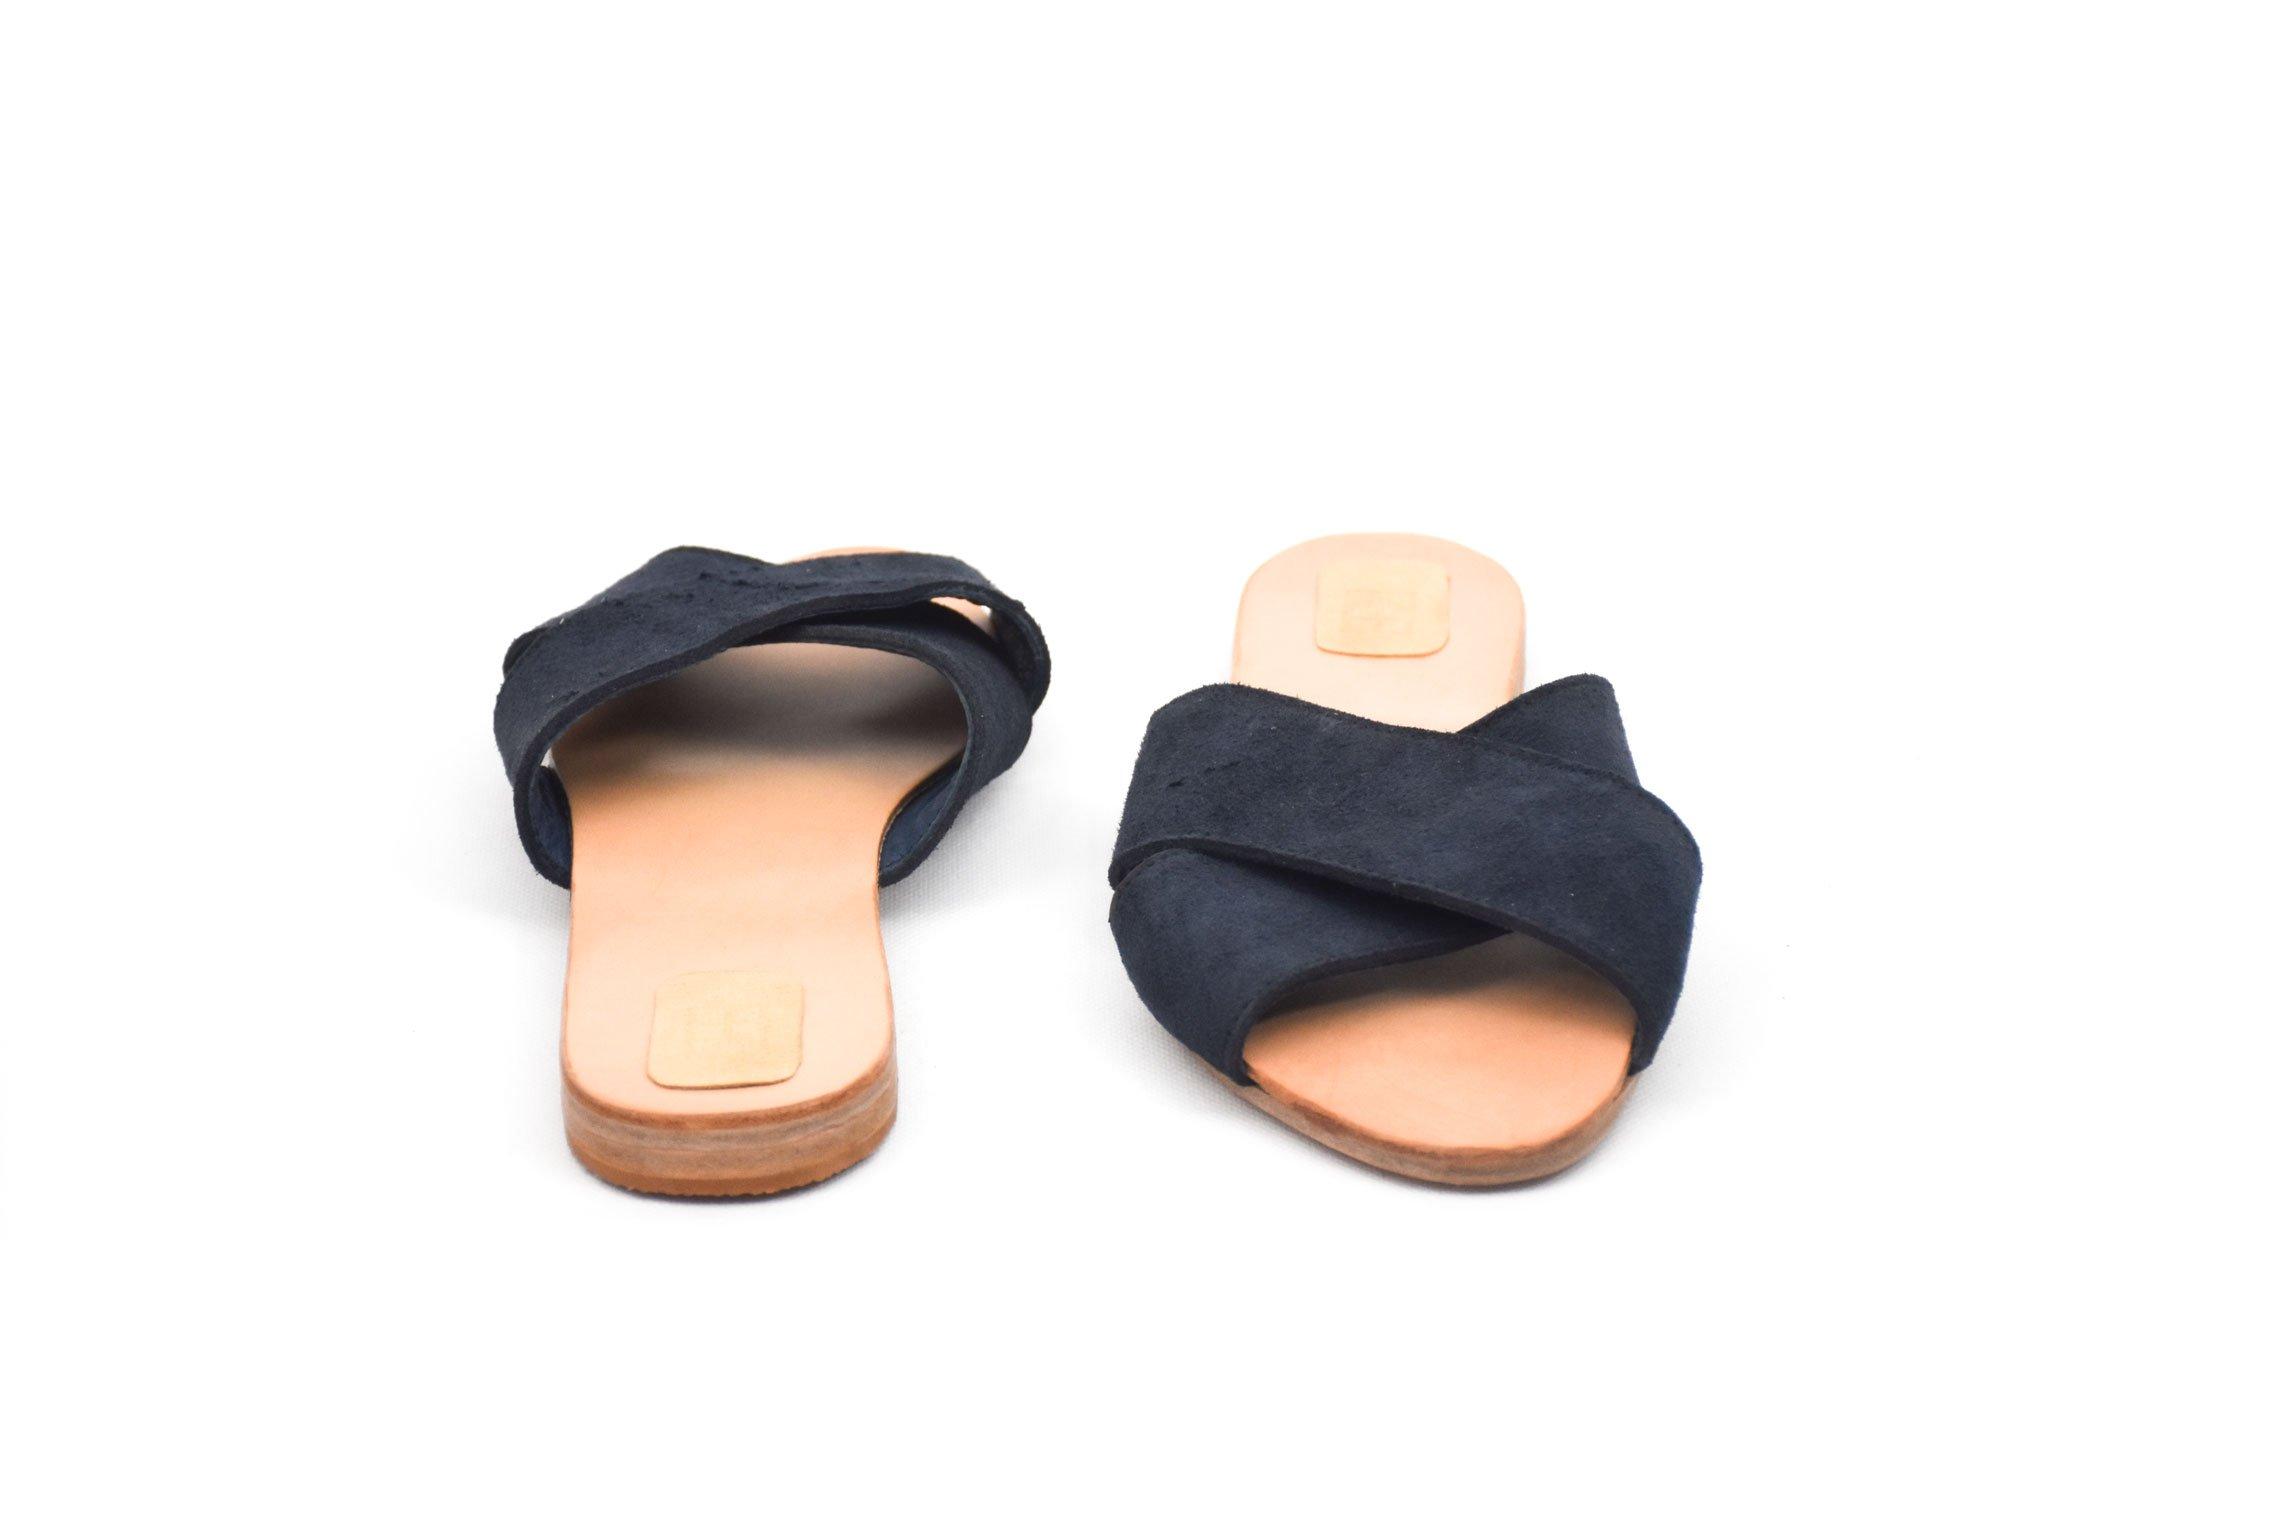 sandalia cuero piel forrada azul ante dark blue